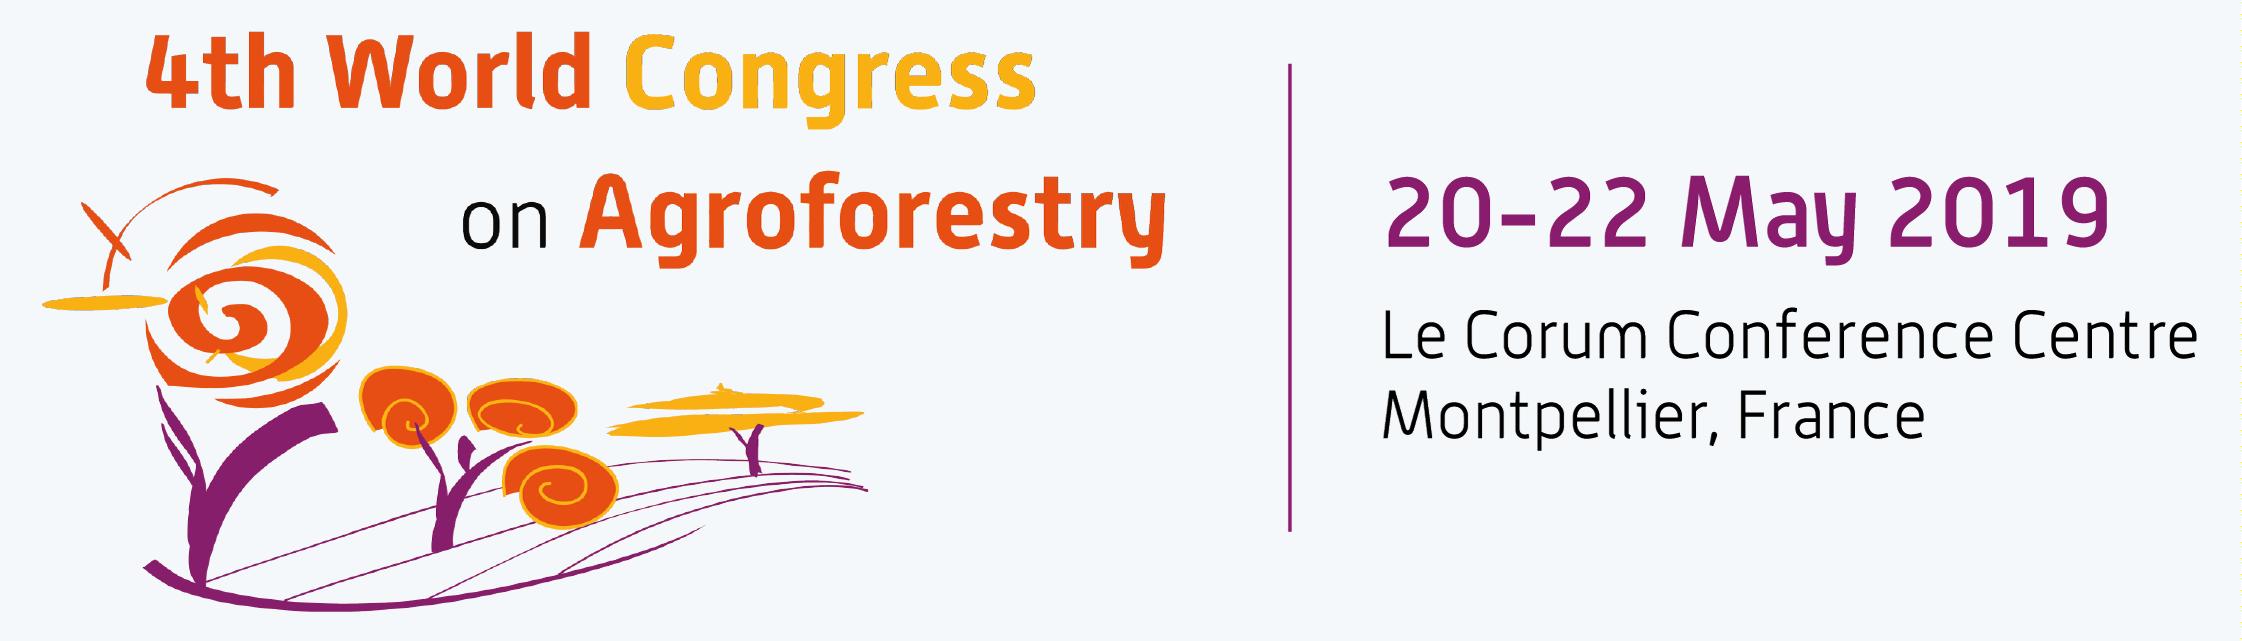 Agroforestry 2019 header